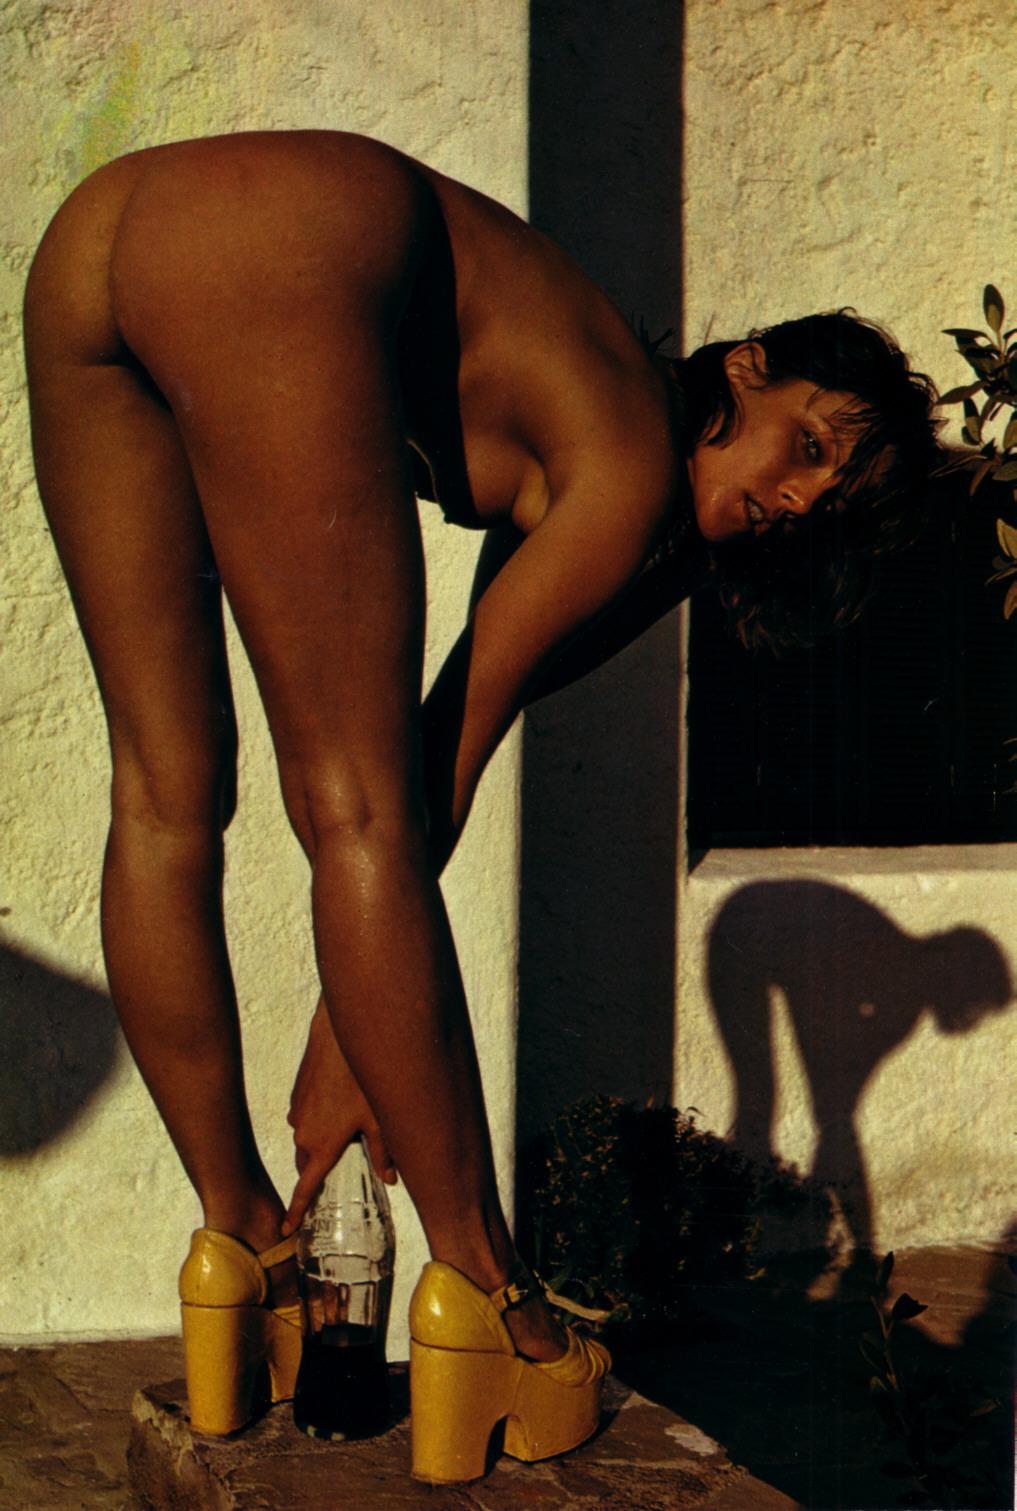 yasmin in vintage by ingret symbolic love